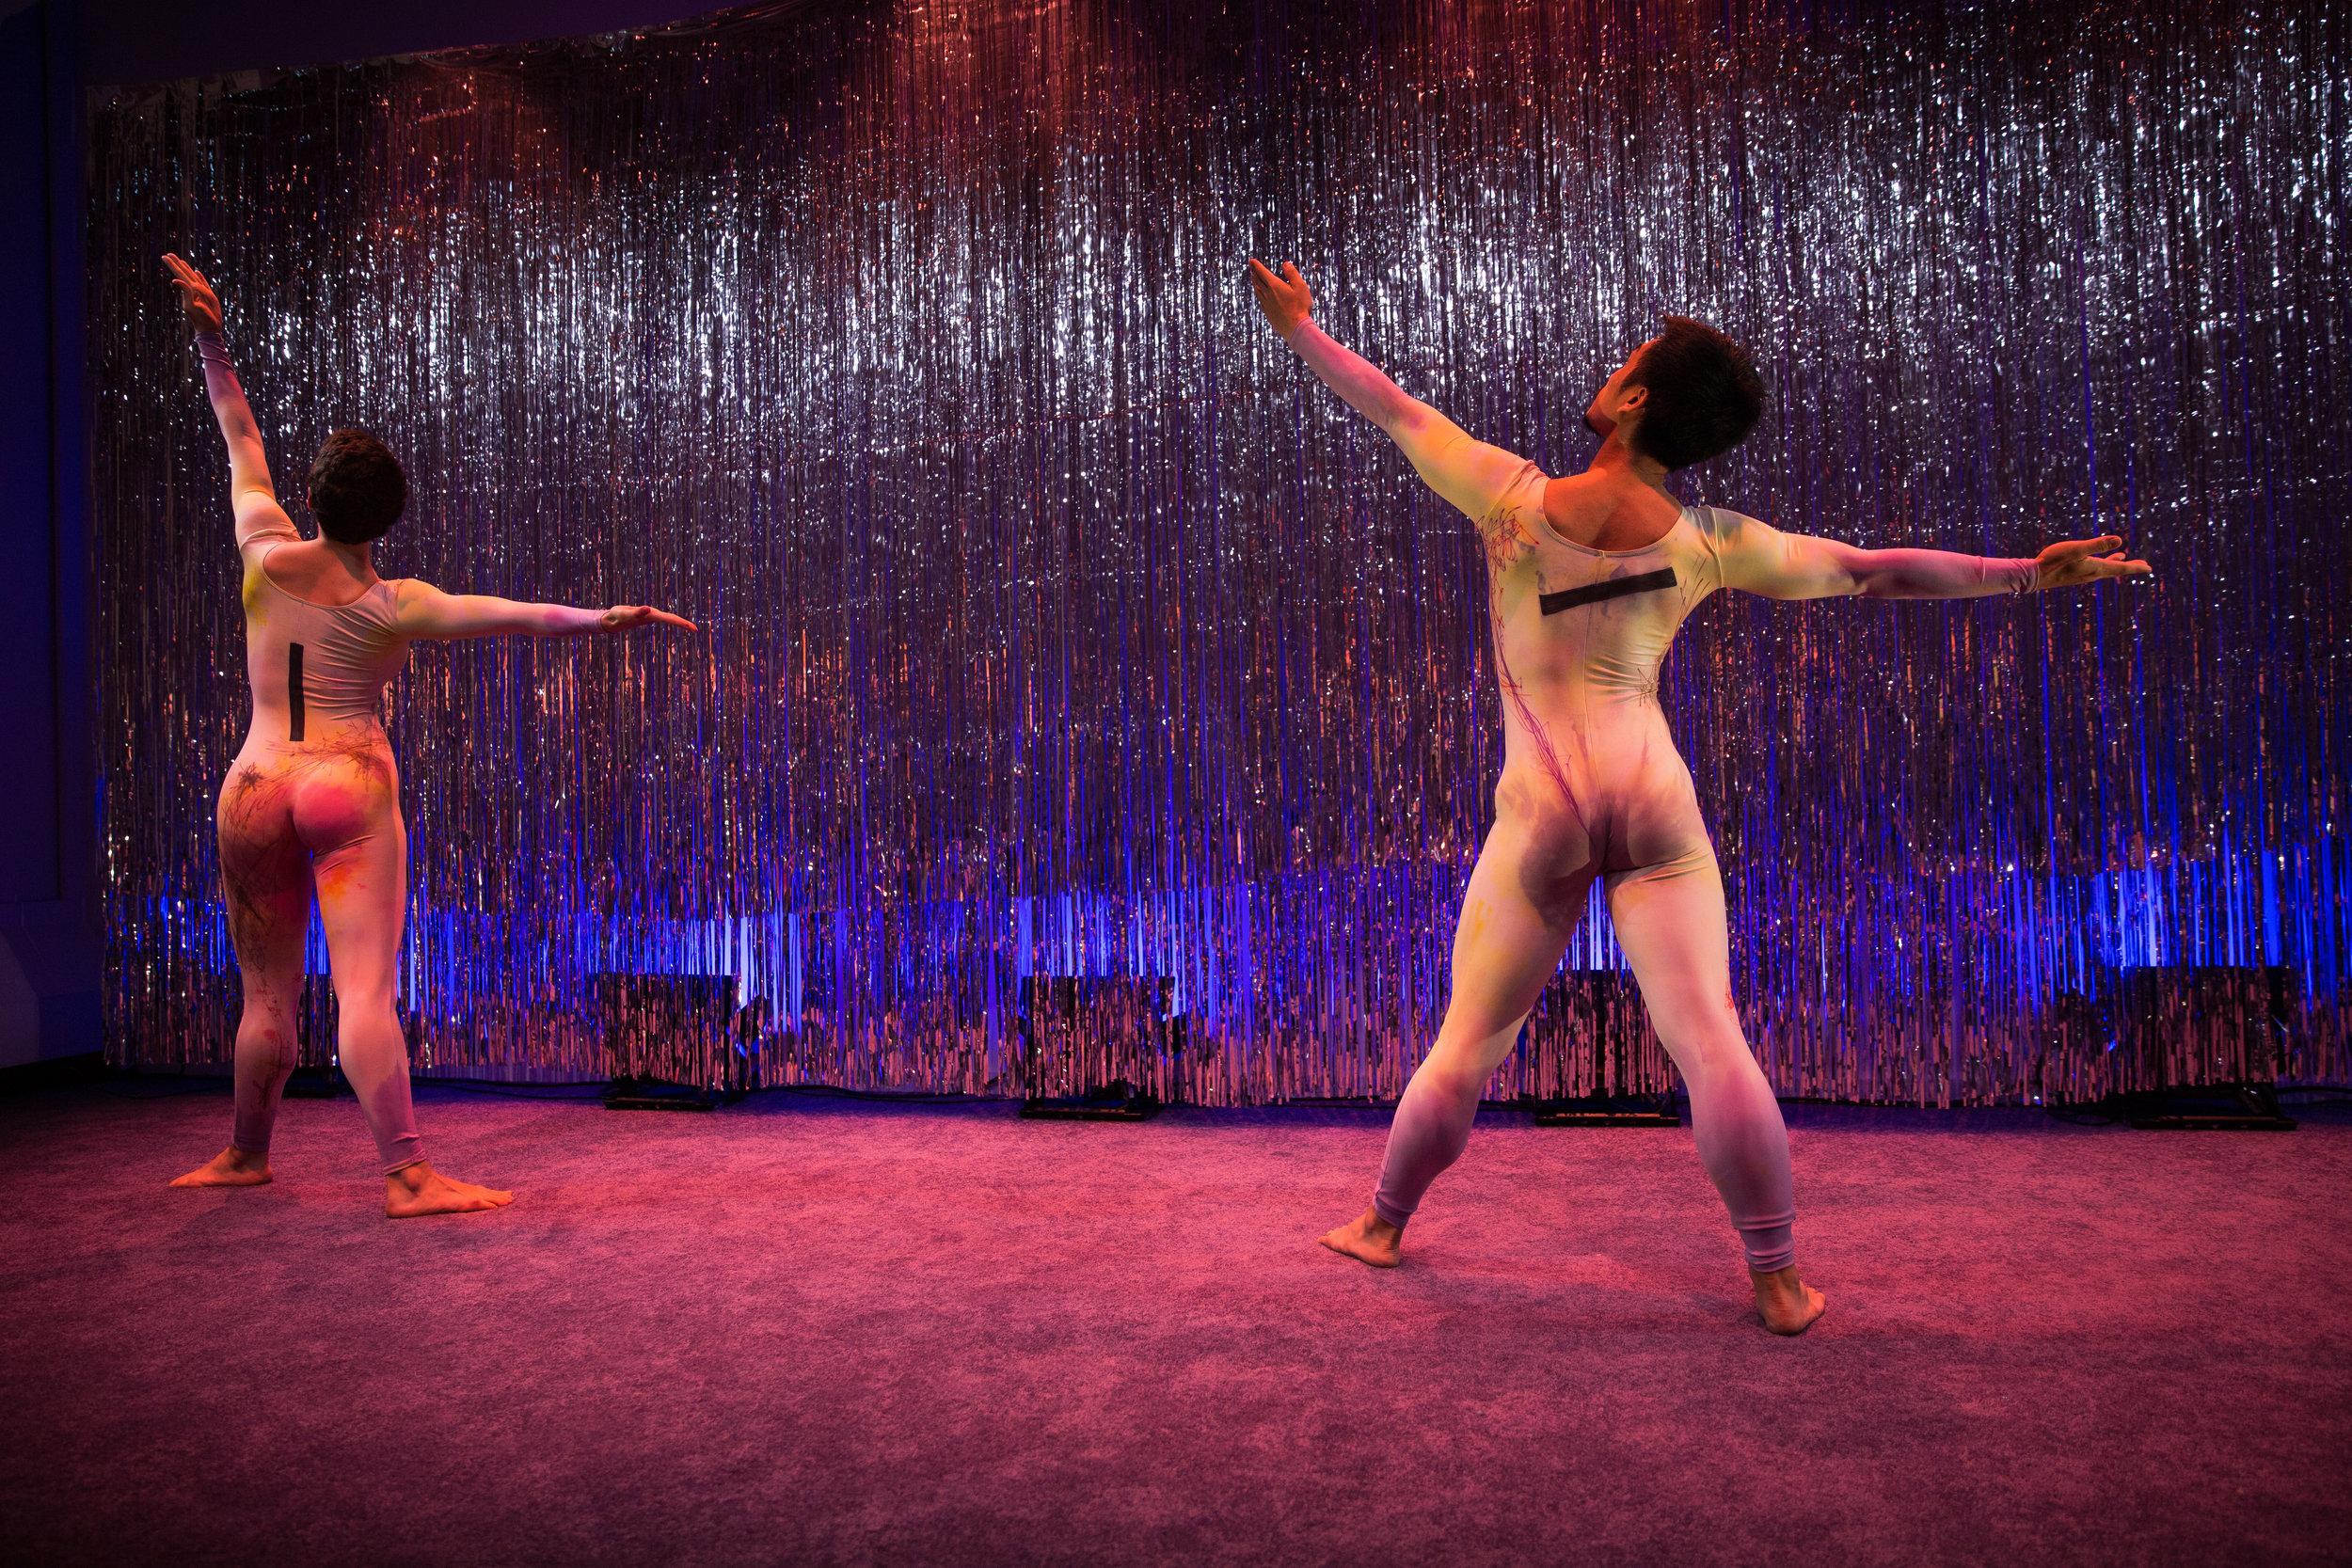 092017-MiriamGabriel&CarloAntonioVillanueva-Untitled(DuetinA)-byScottShaw-6.jpg